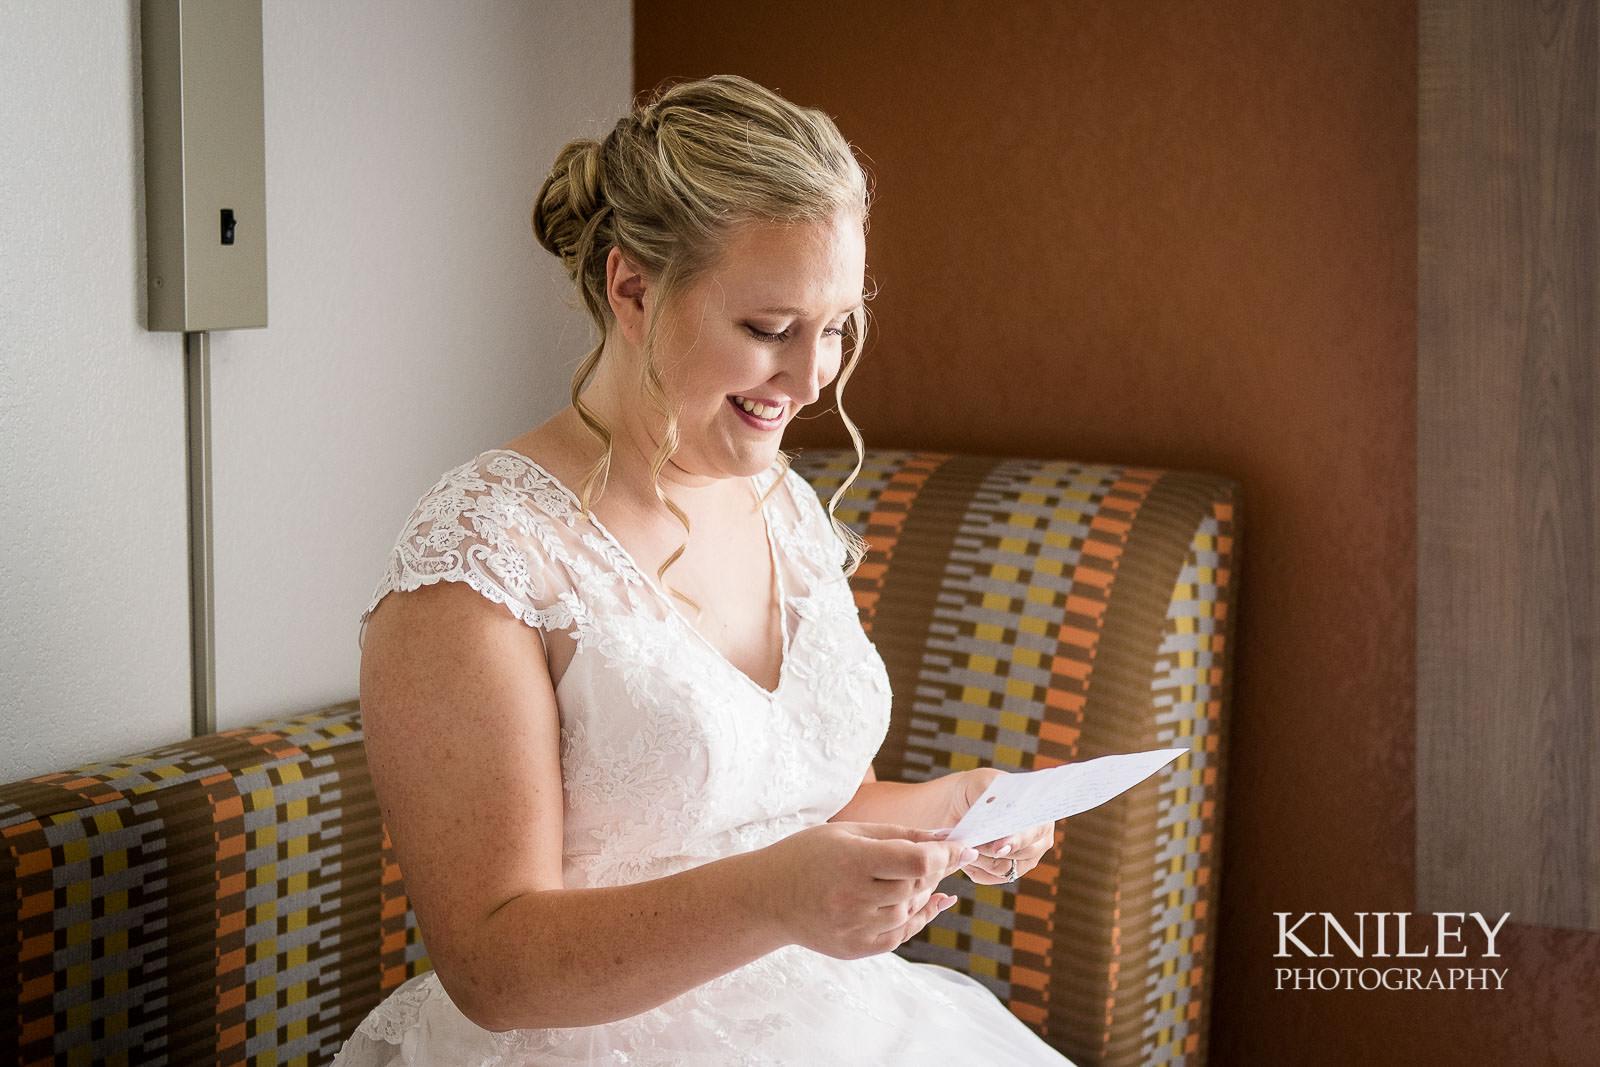 15-Holiday-Inn-Webster-NY-Wedding-Getting-Ready-Photography.jpg